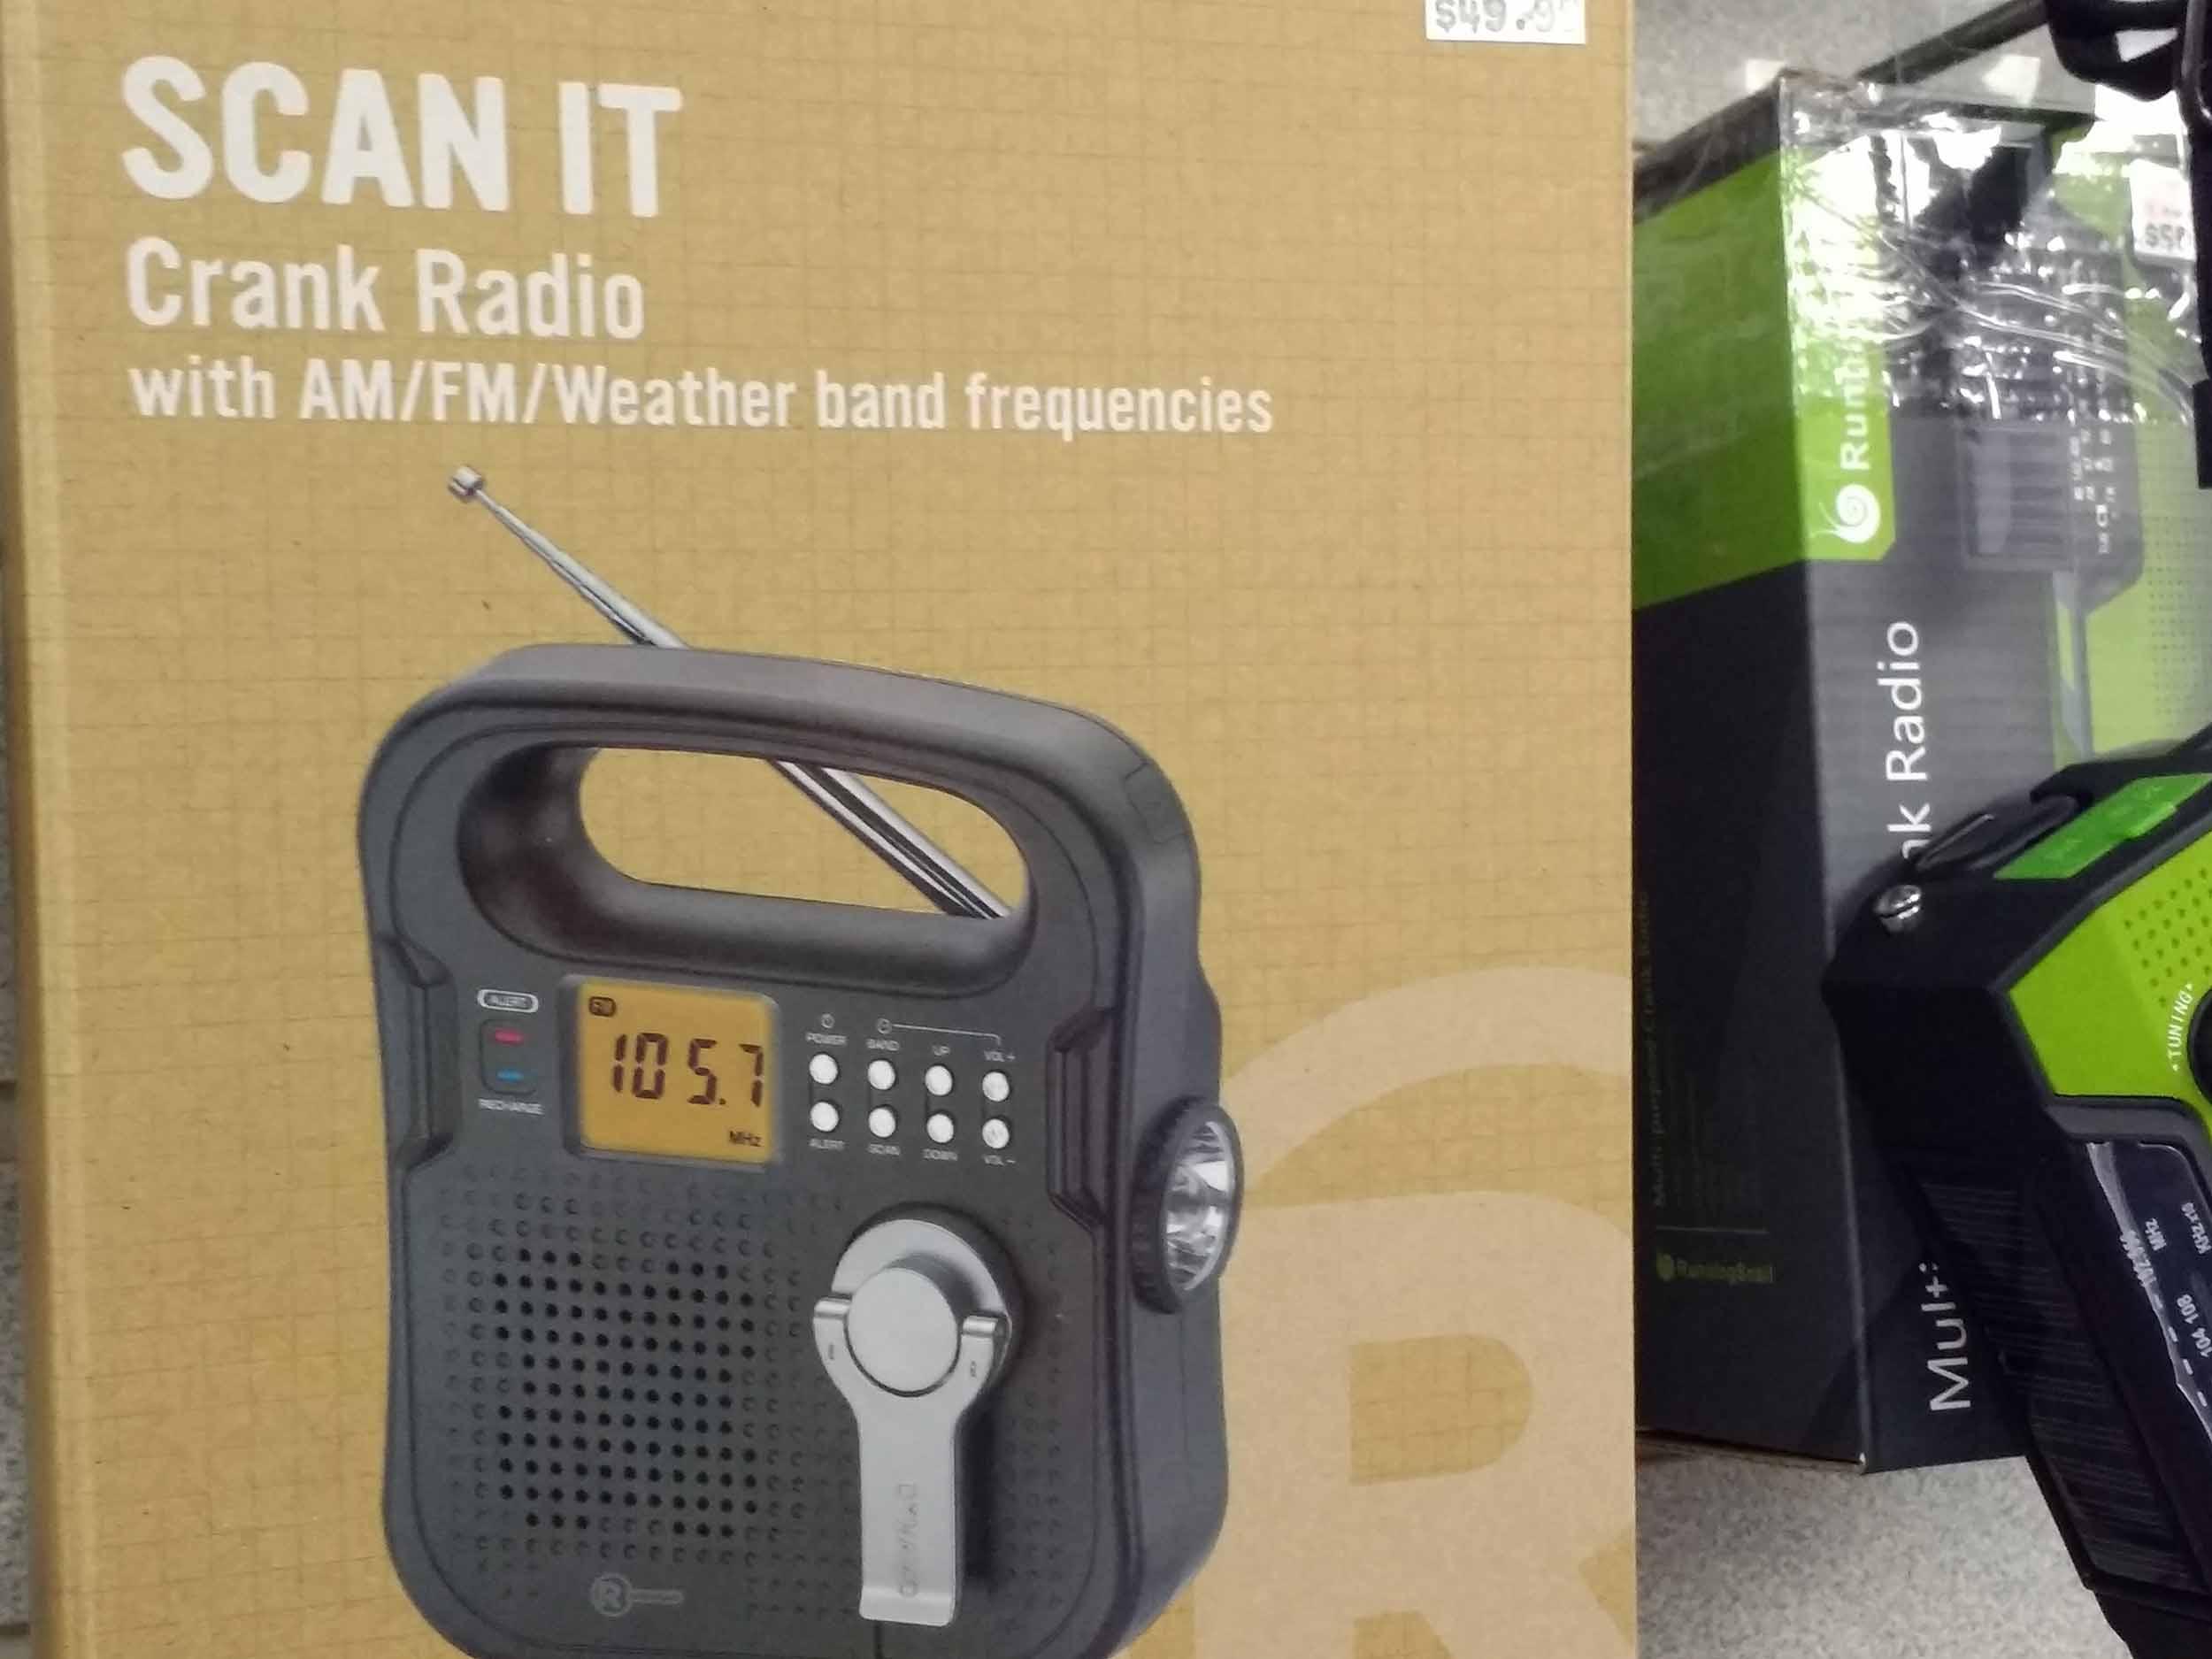 Crank radio for remote operation